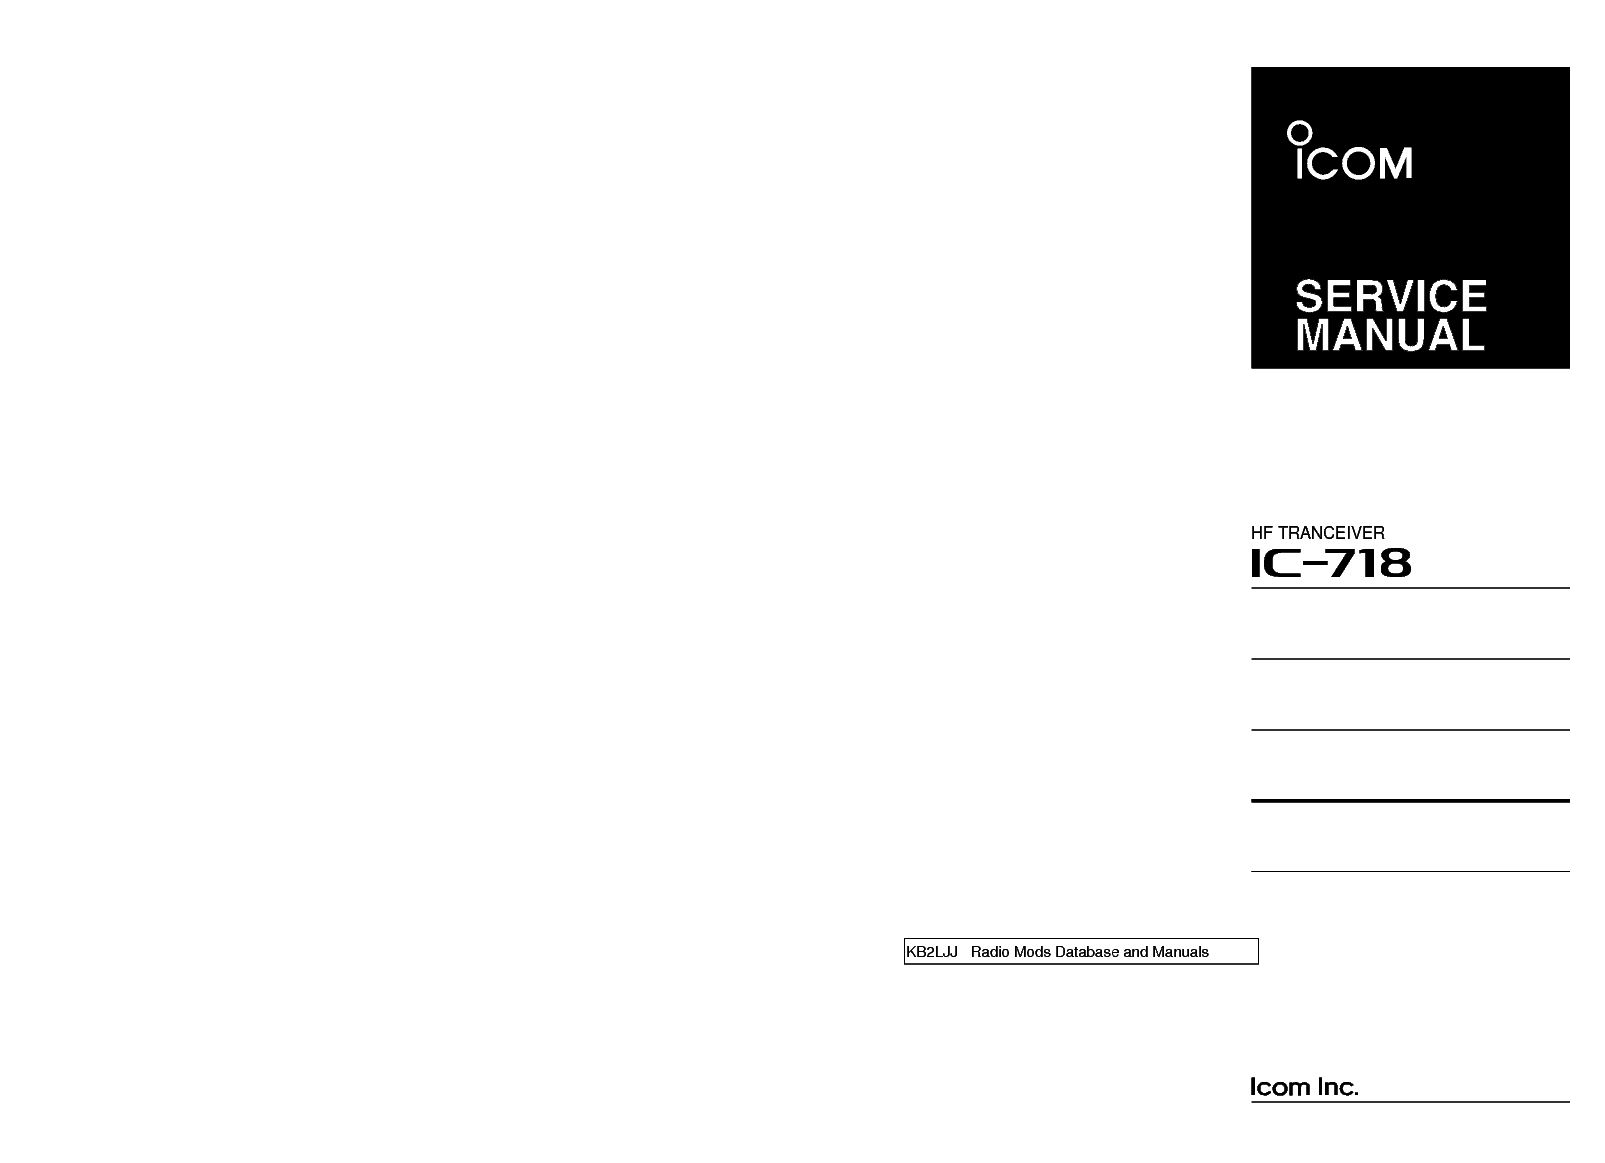 ICOM IC-718 SERVICE MANUAL service manual (1st page)